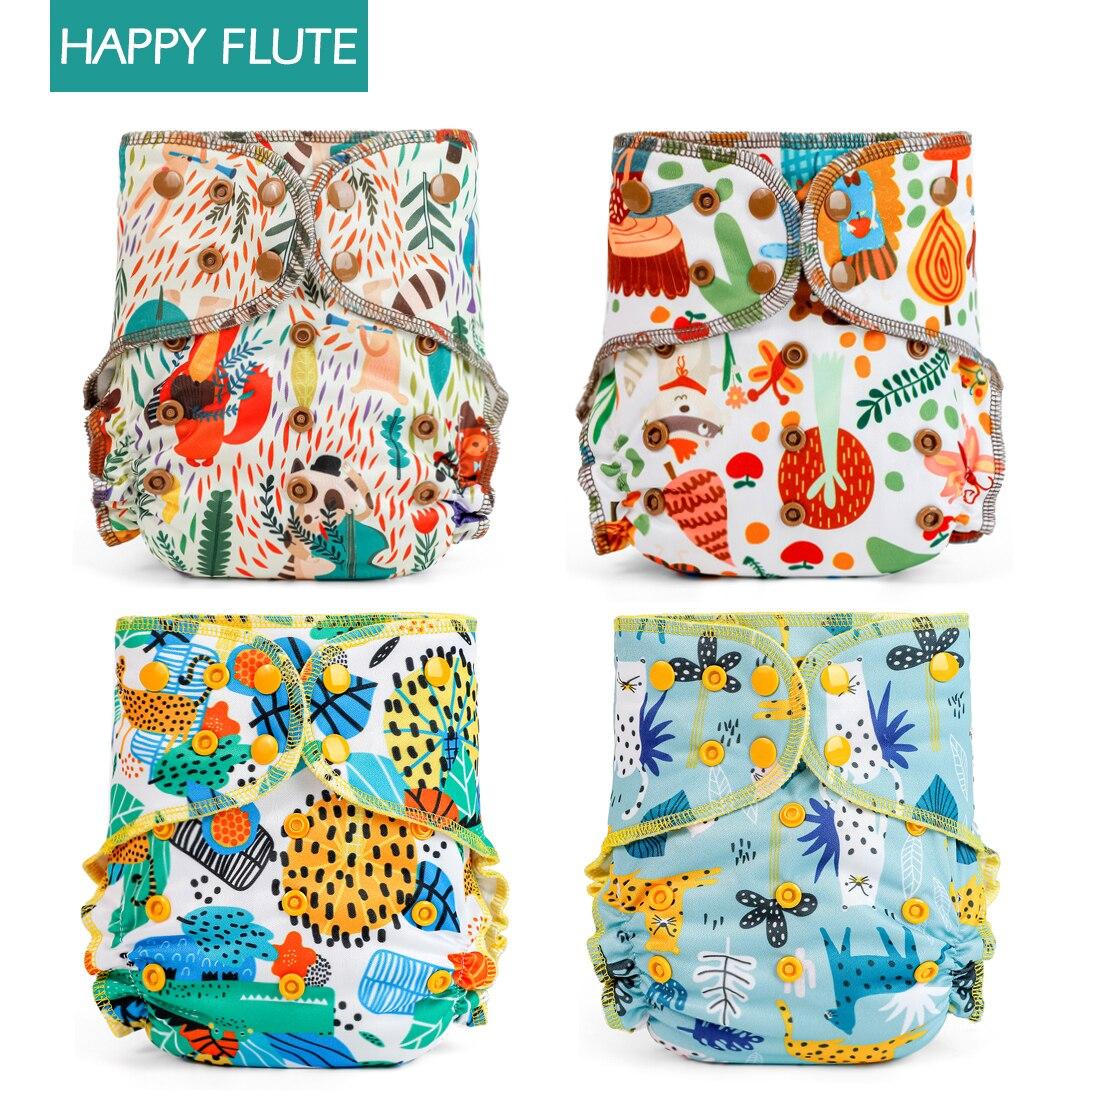 4pcs Happy flute Organic Cotton Cloth Diaper Nappy One Size Pocket Reusable Diapers Eco-friendly fit 3-15kg baby